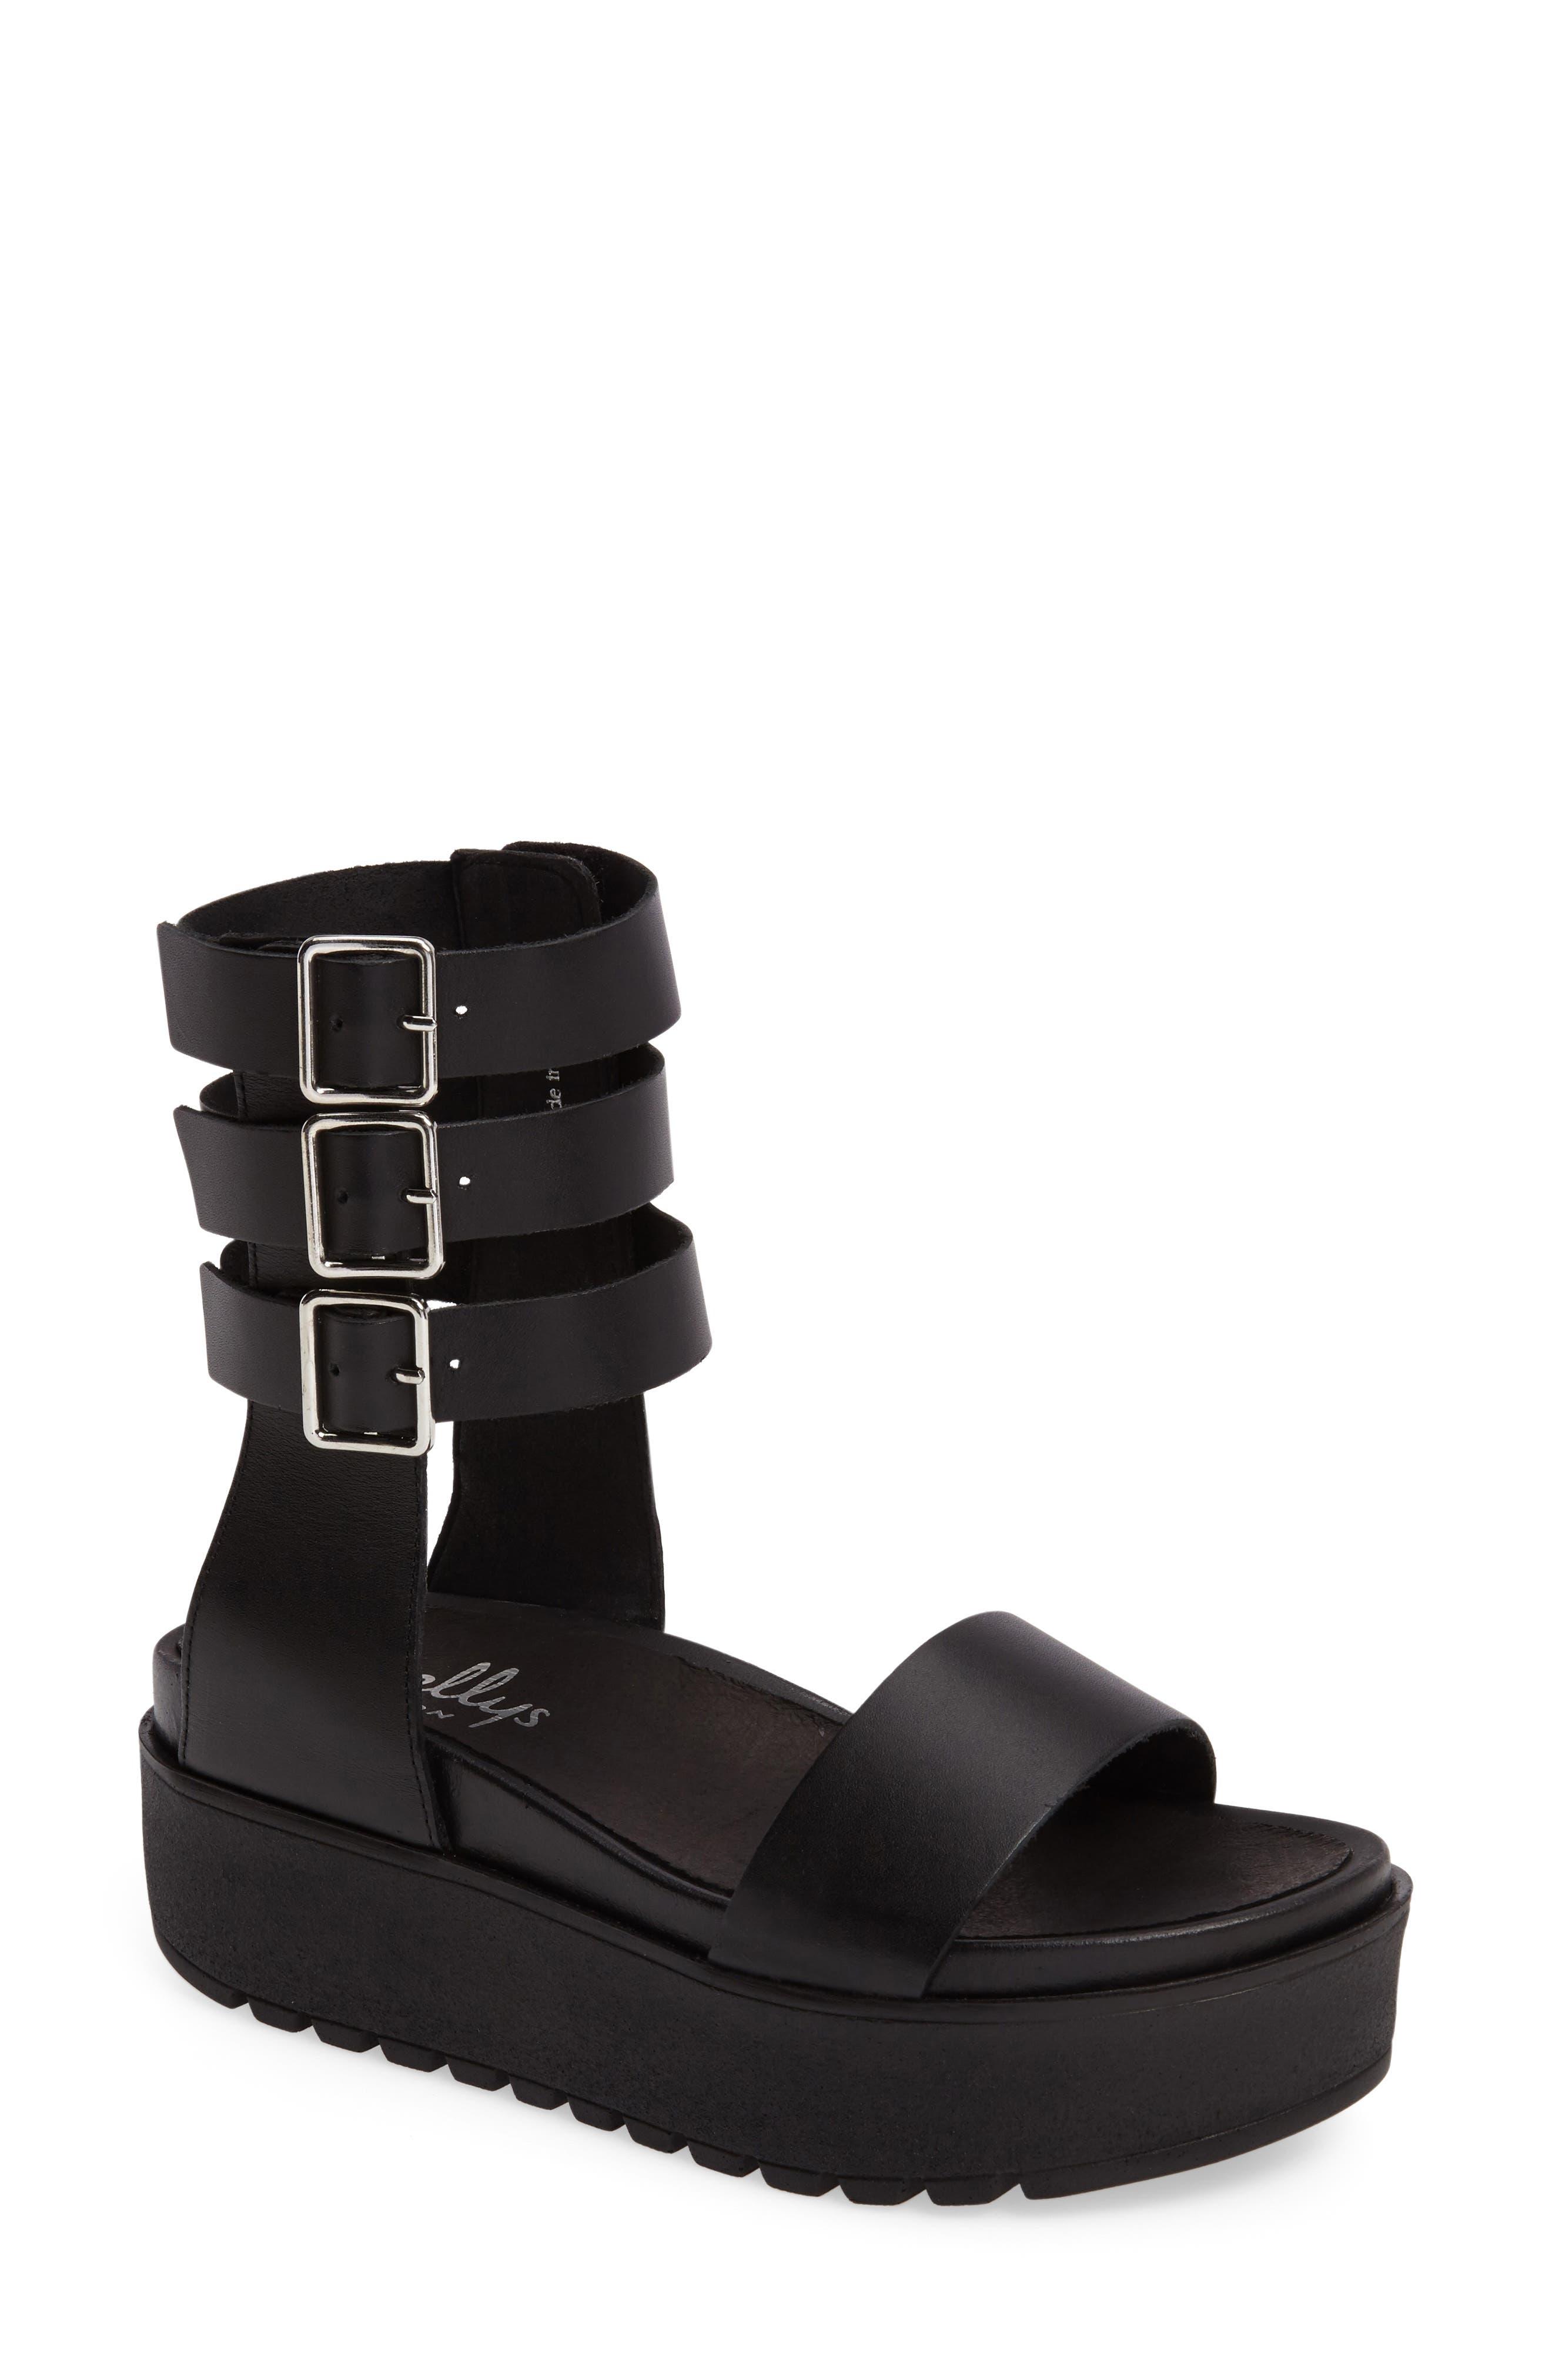 Kegan Platform Gladiator Sandal,                         Main,                         color, 001